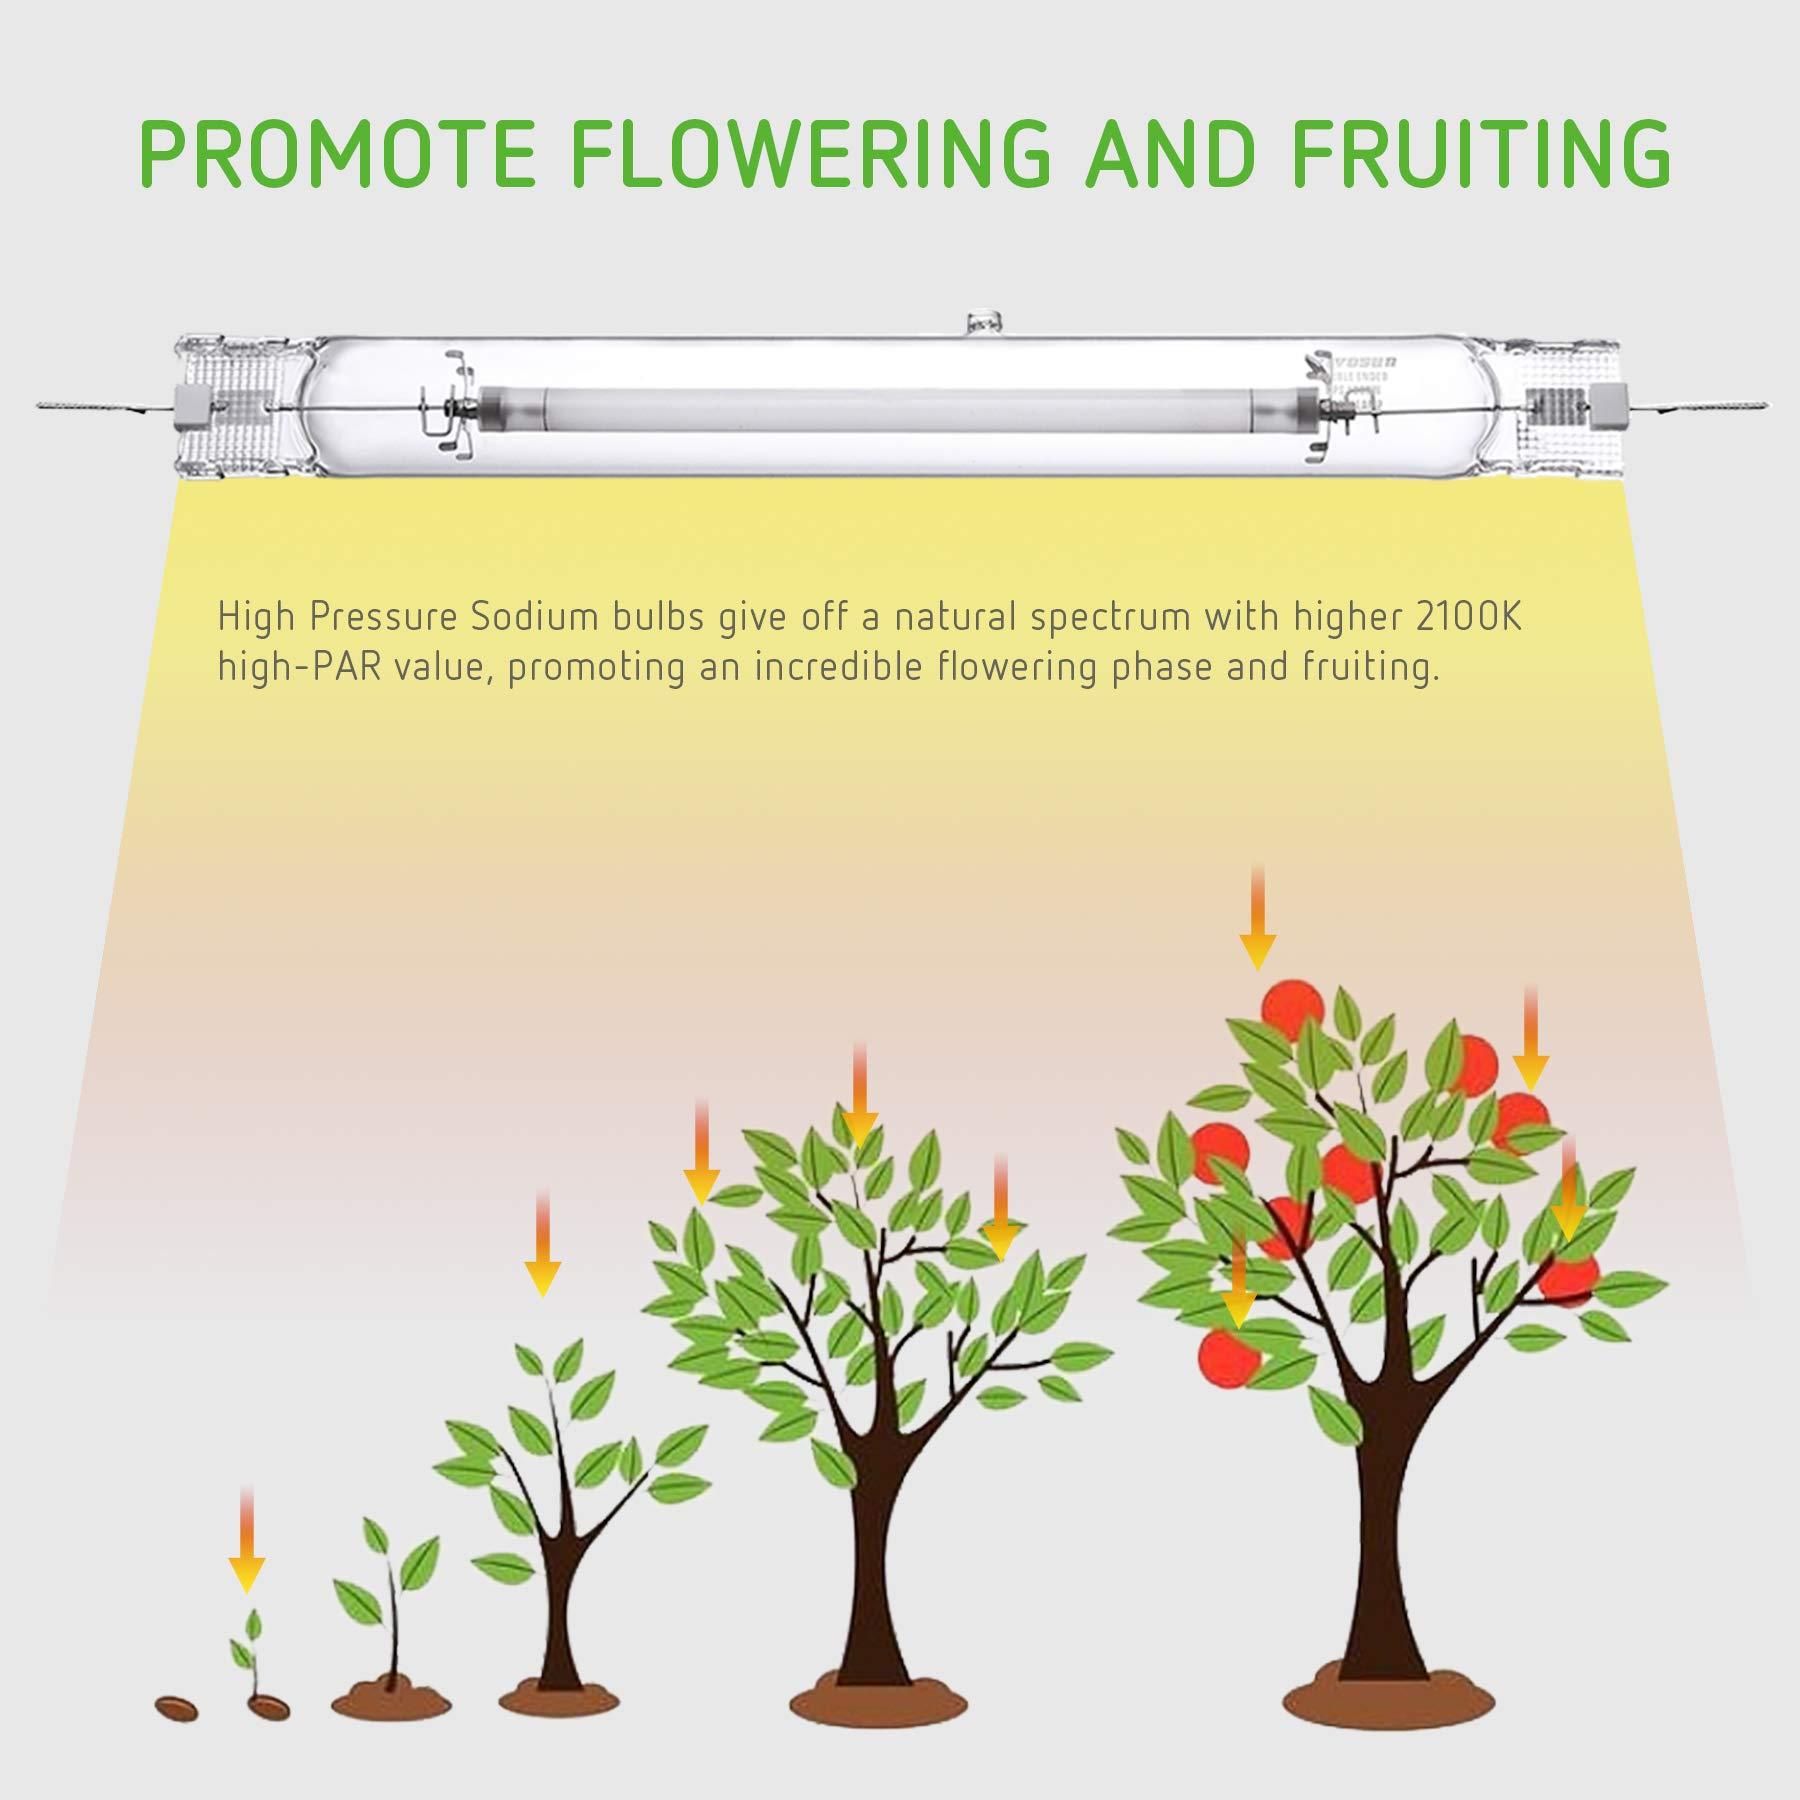 VIVOSUN 2 Pack of 1000W Double Ended High Pressure Sodium DE HPS Grow Bulb - Super Lumens 151,000 for Flourishing Growth [CCT 2100K] by VIVOSUN (Image #4)